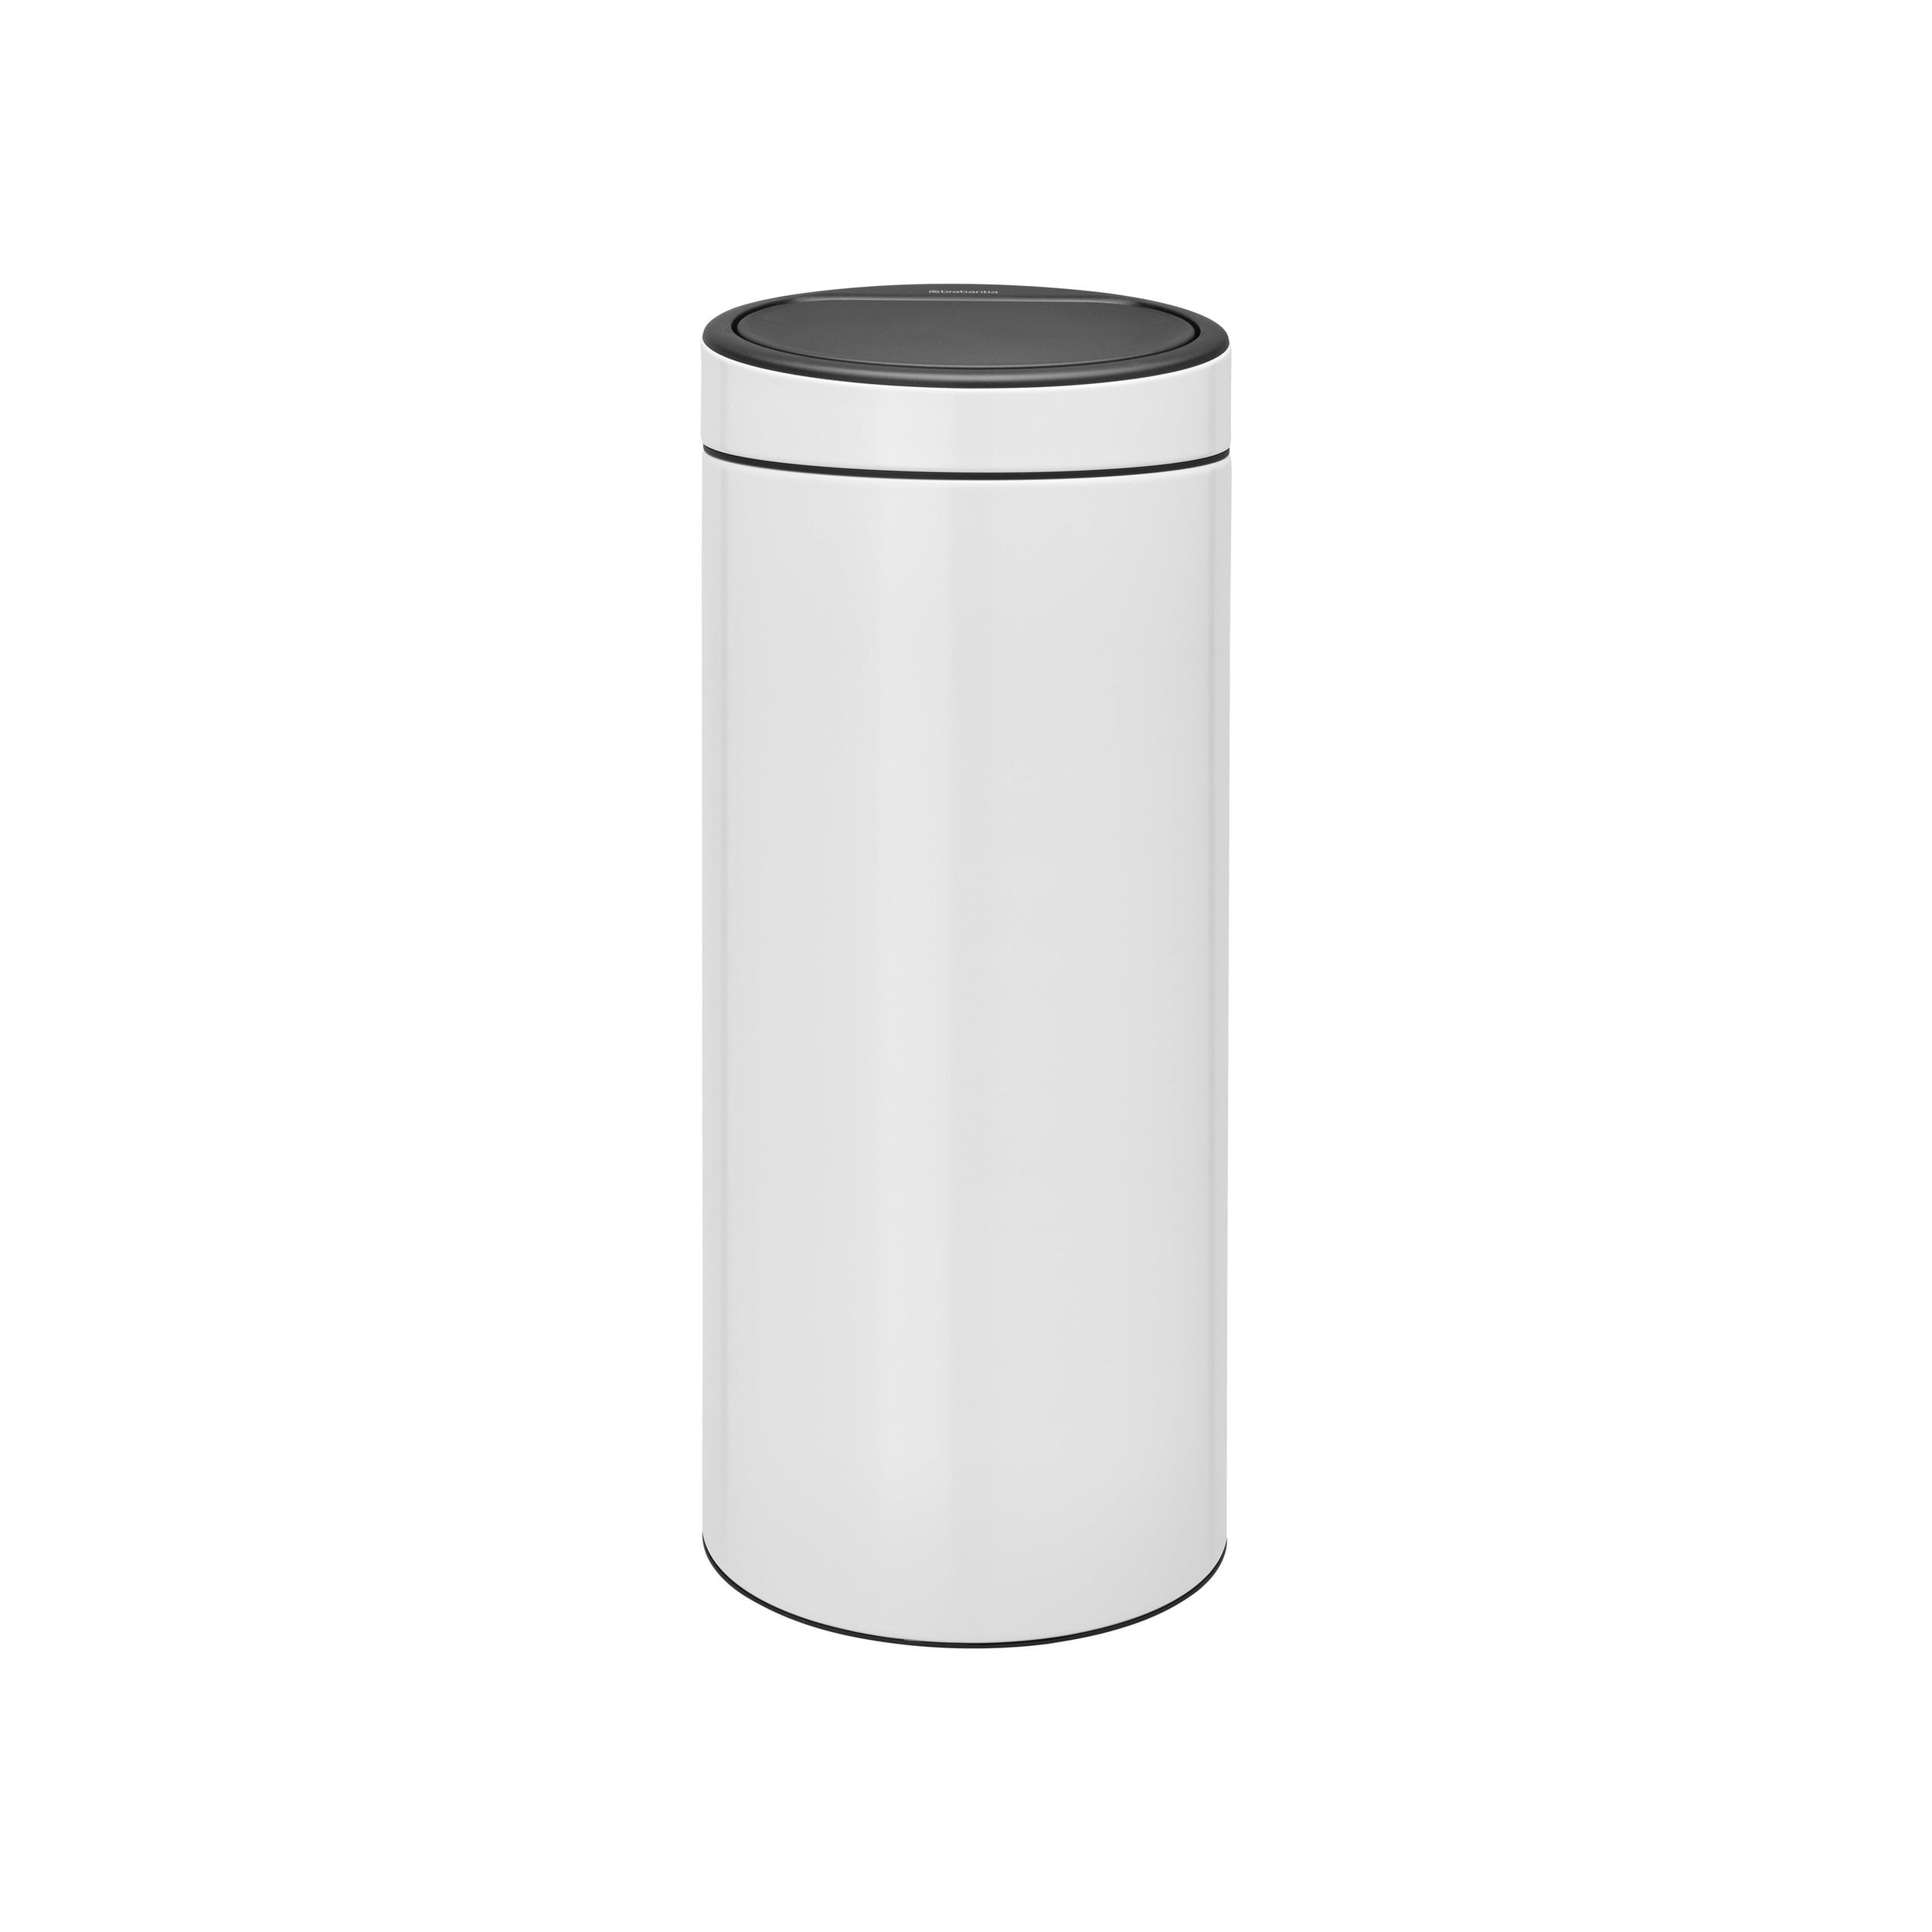 Prullenbak Brabantia Touch Bin 45 Liter.Brabantia Touch Bin New Afvalemmer 30 Liter White Brabantia Touch Bin New Afvalemmer 30 Liter White